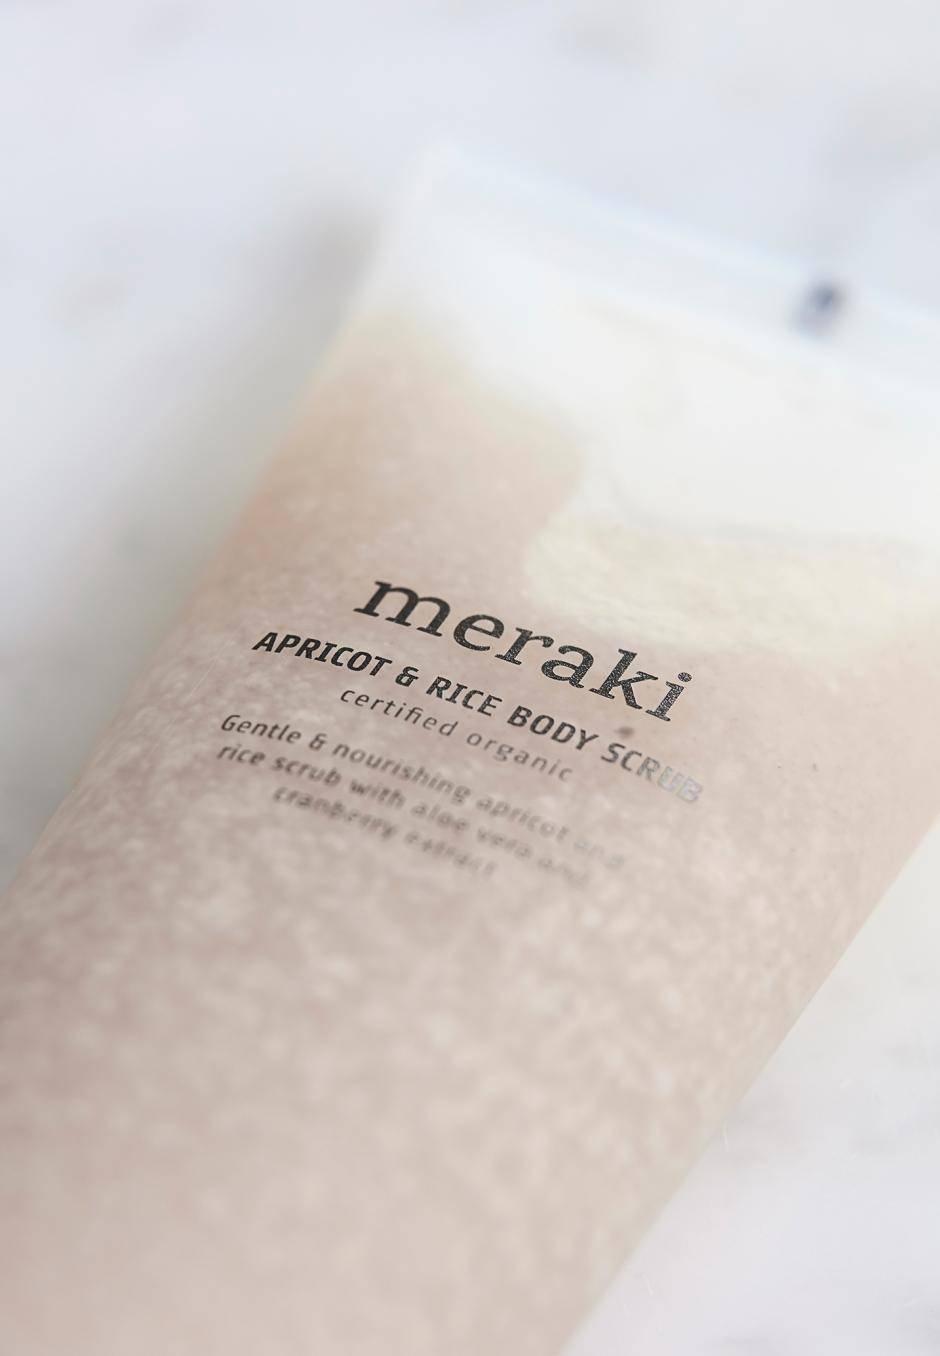 Meraki Body Scrub Apricot & Rice